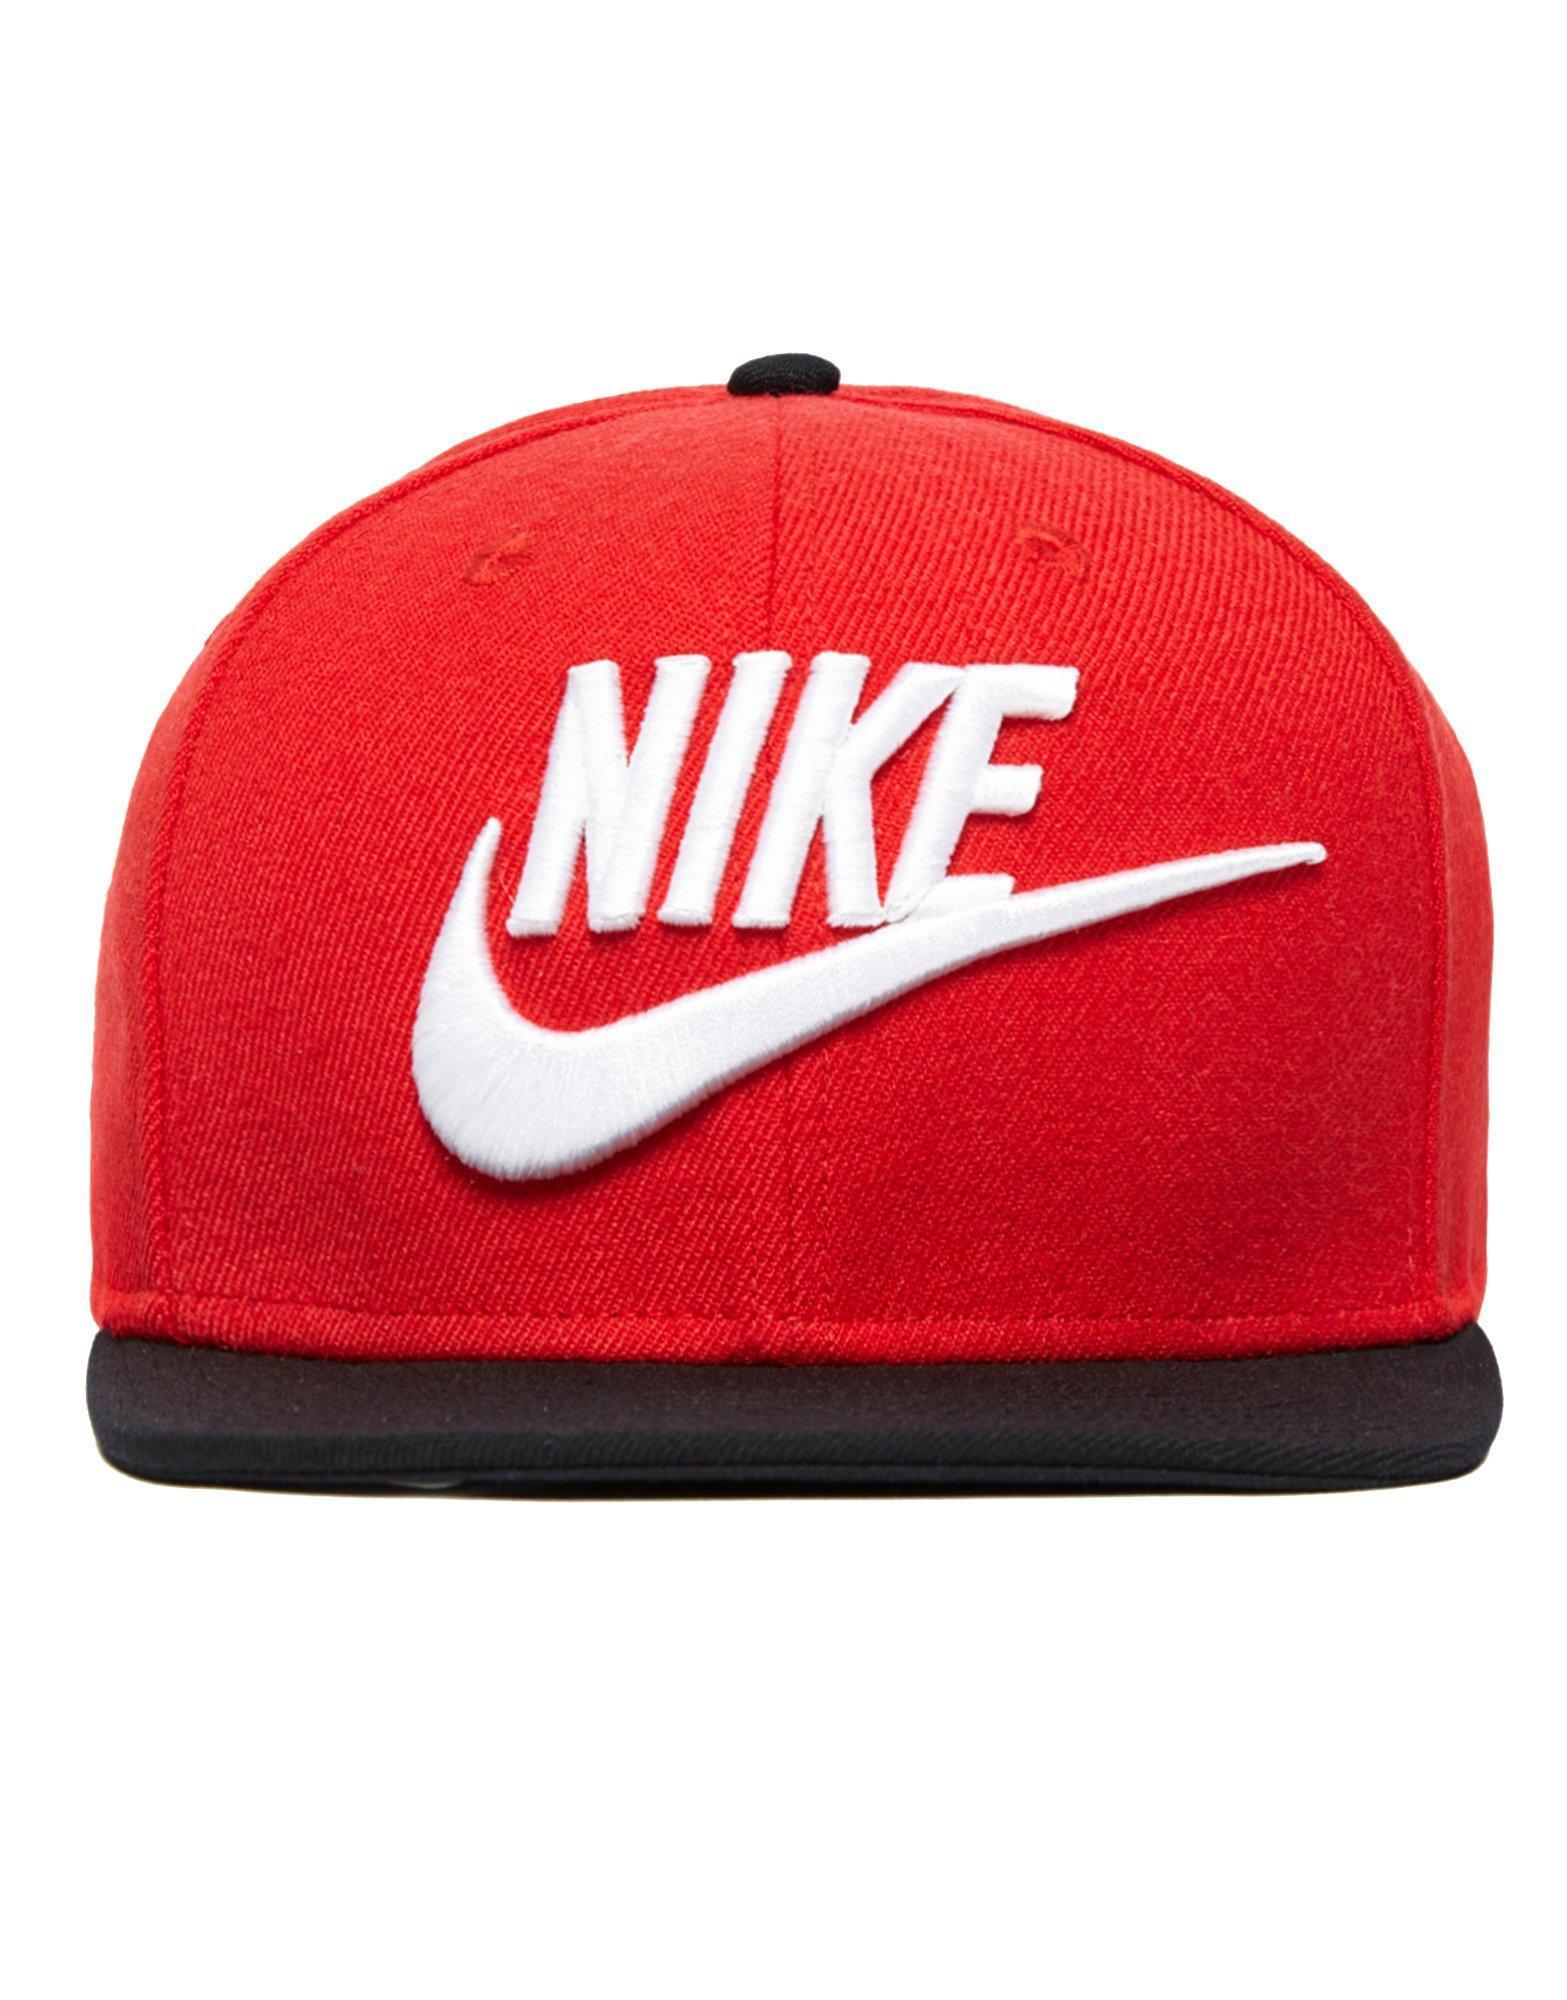 3c3f4aa6fe9 Lyst - Nike Futura True 2 Snapback Cap in Red for Men